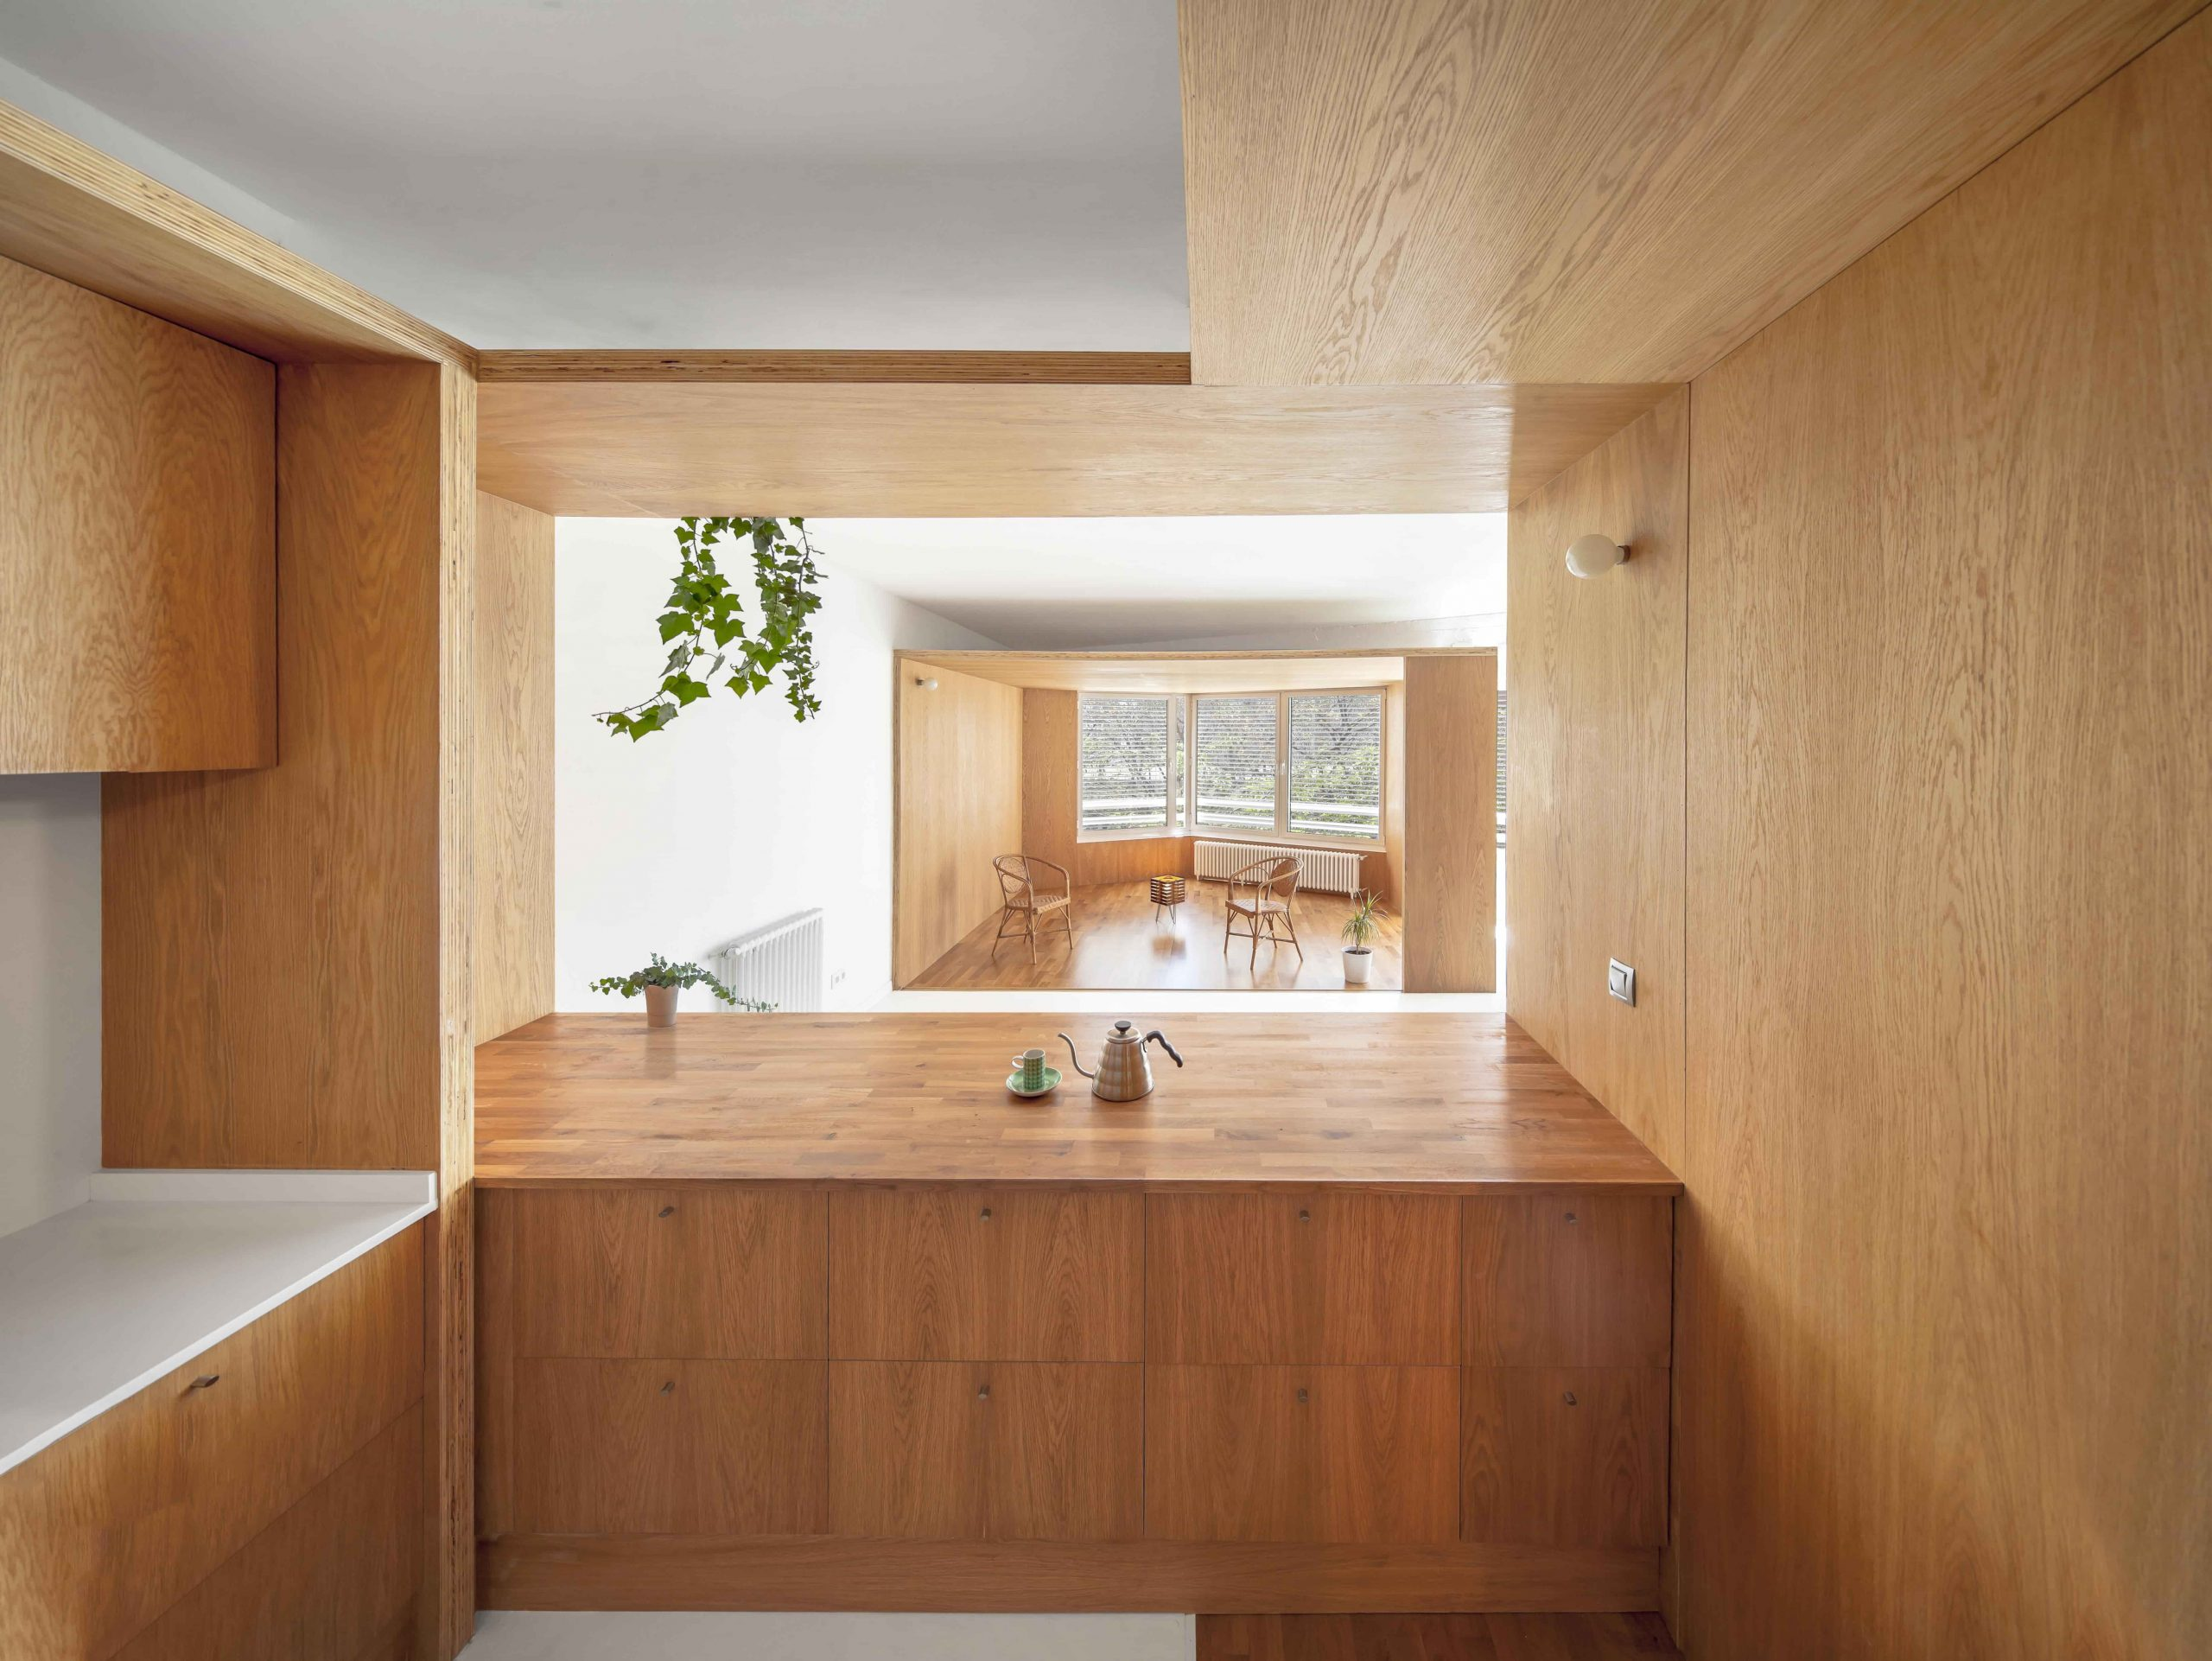 Cocina de la rehabilitación arquitectónica del apartamento extenso-intenso en Barcelona